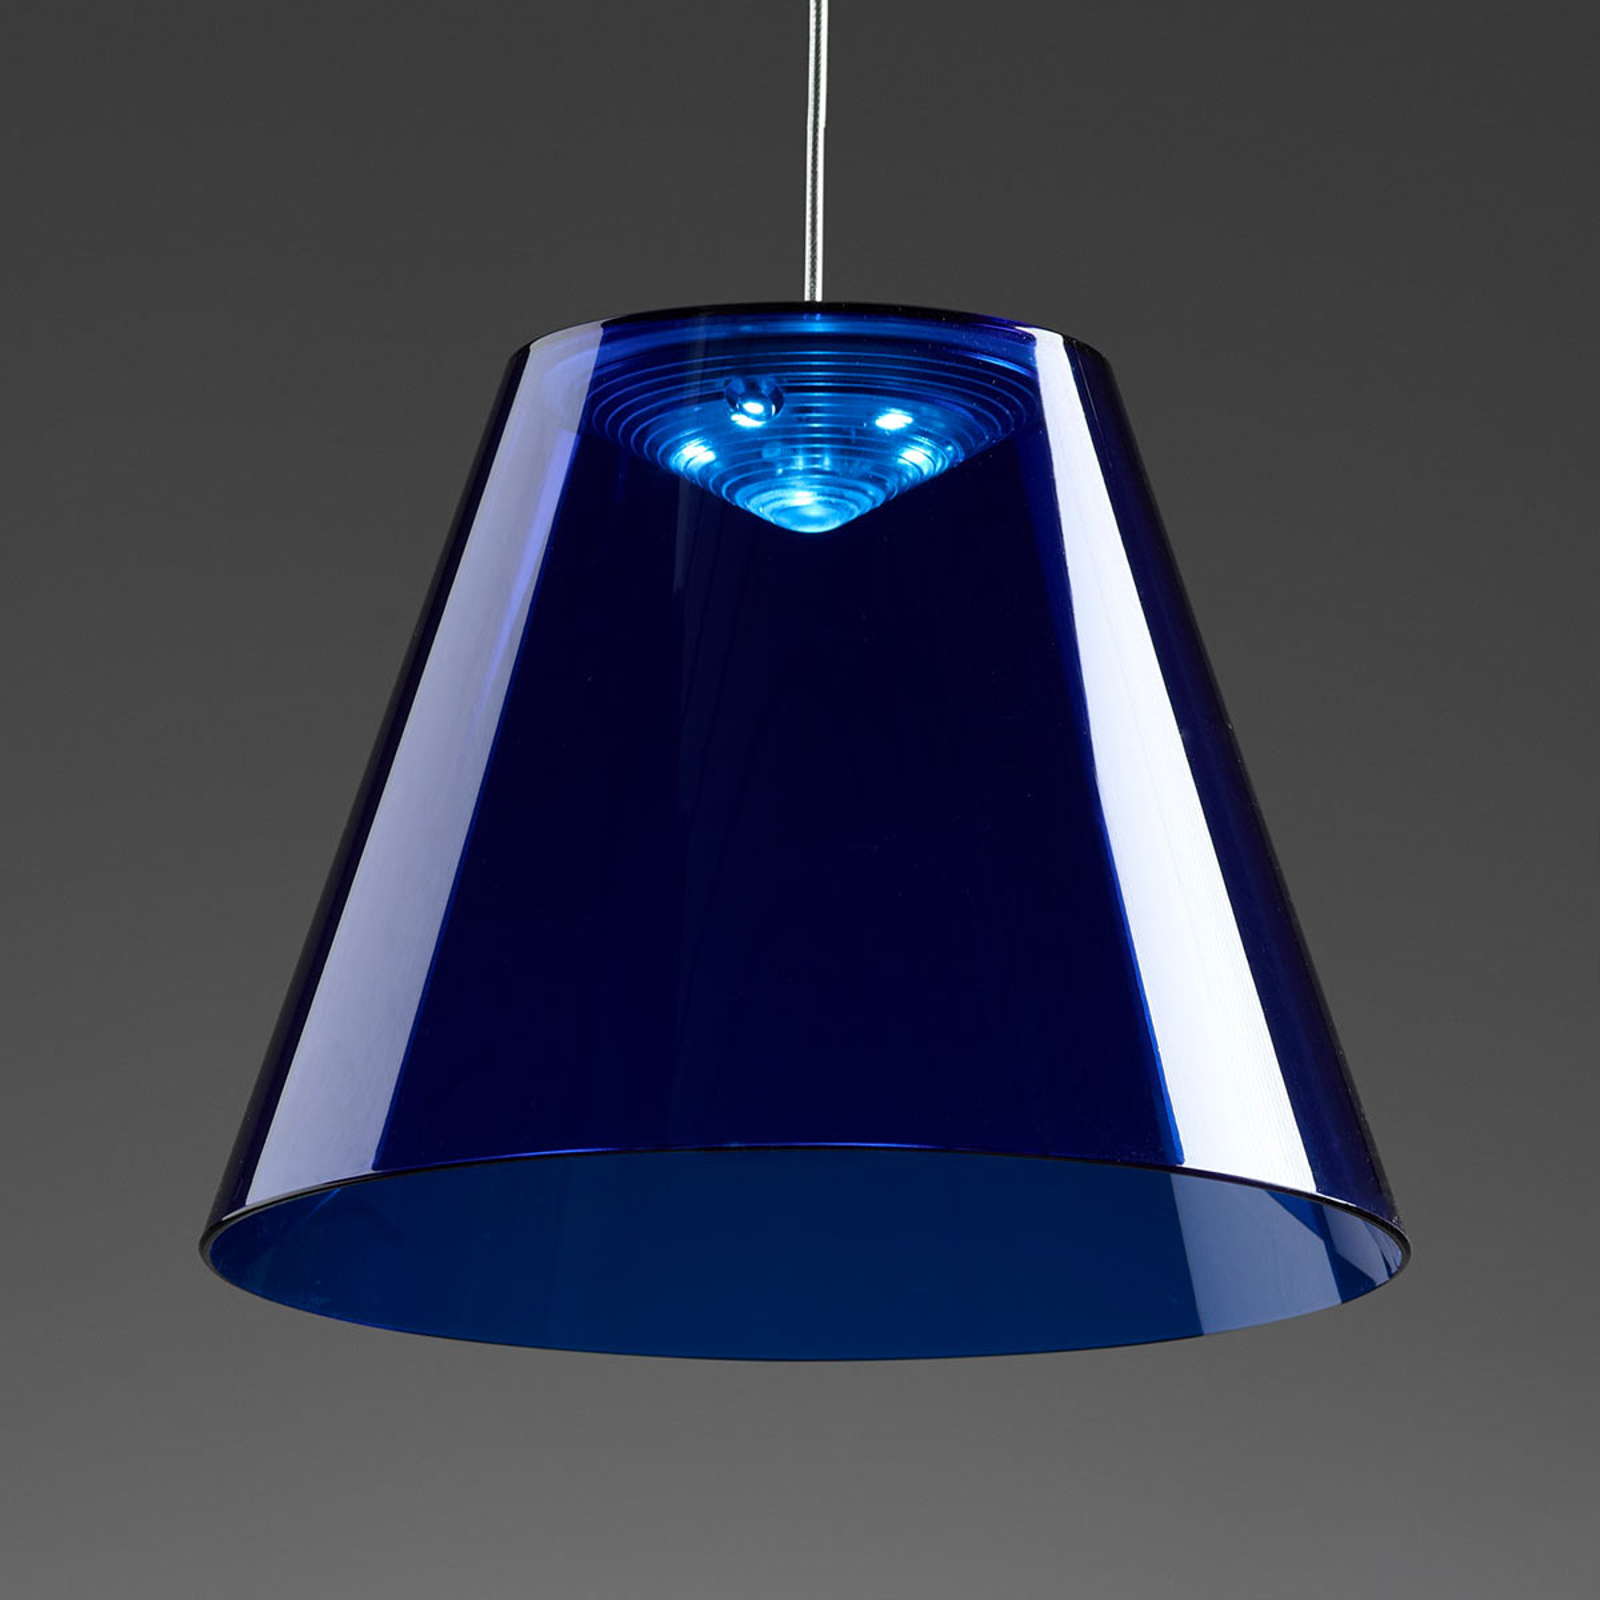 Rotaliana Dina - blaue LED-Hängeleuchte